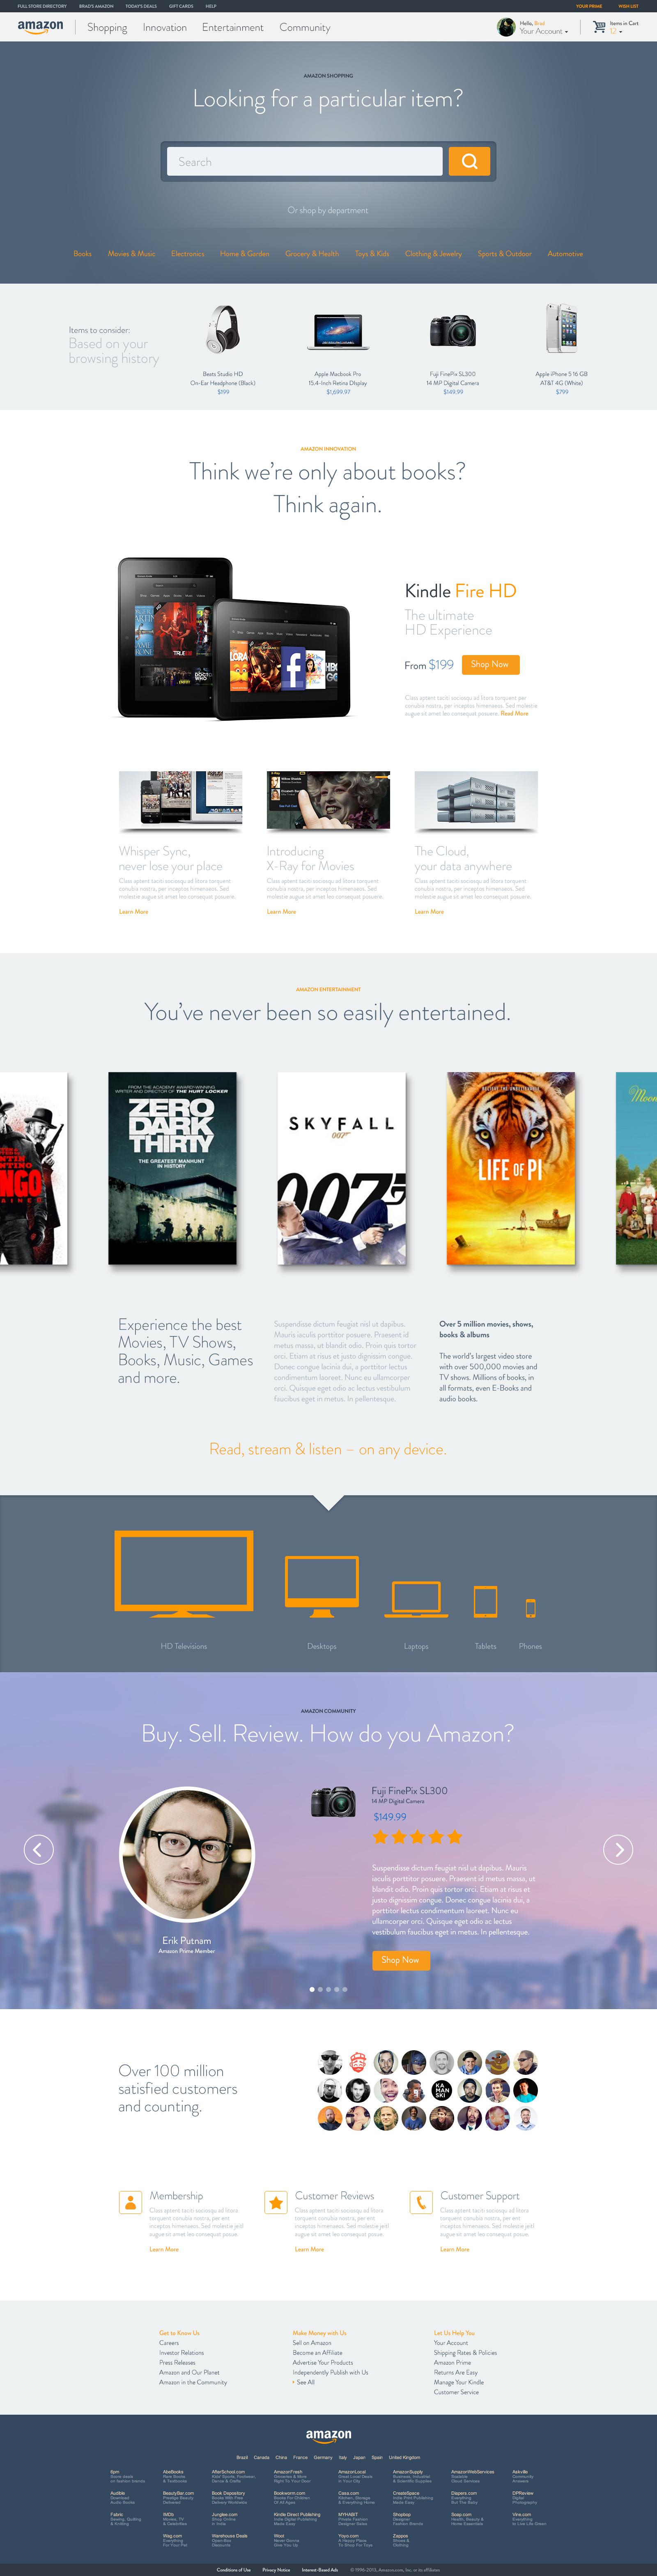 Amazon Full Px Jpg By Brad Burke Web Layout Design Web Design Inspiration Web Design